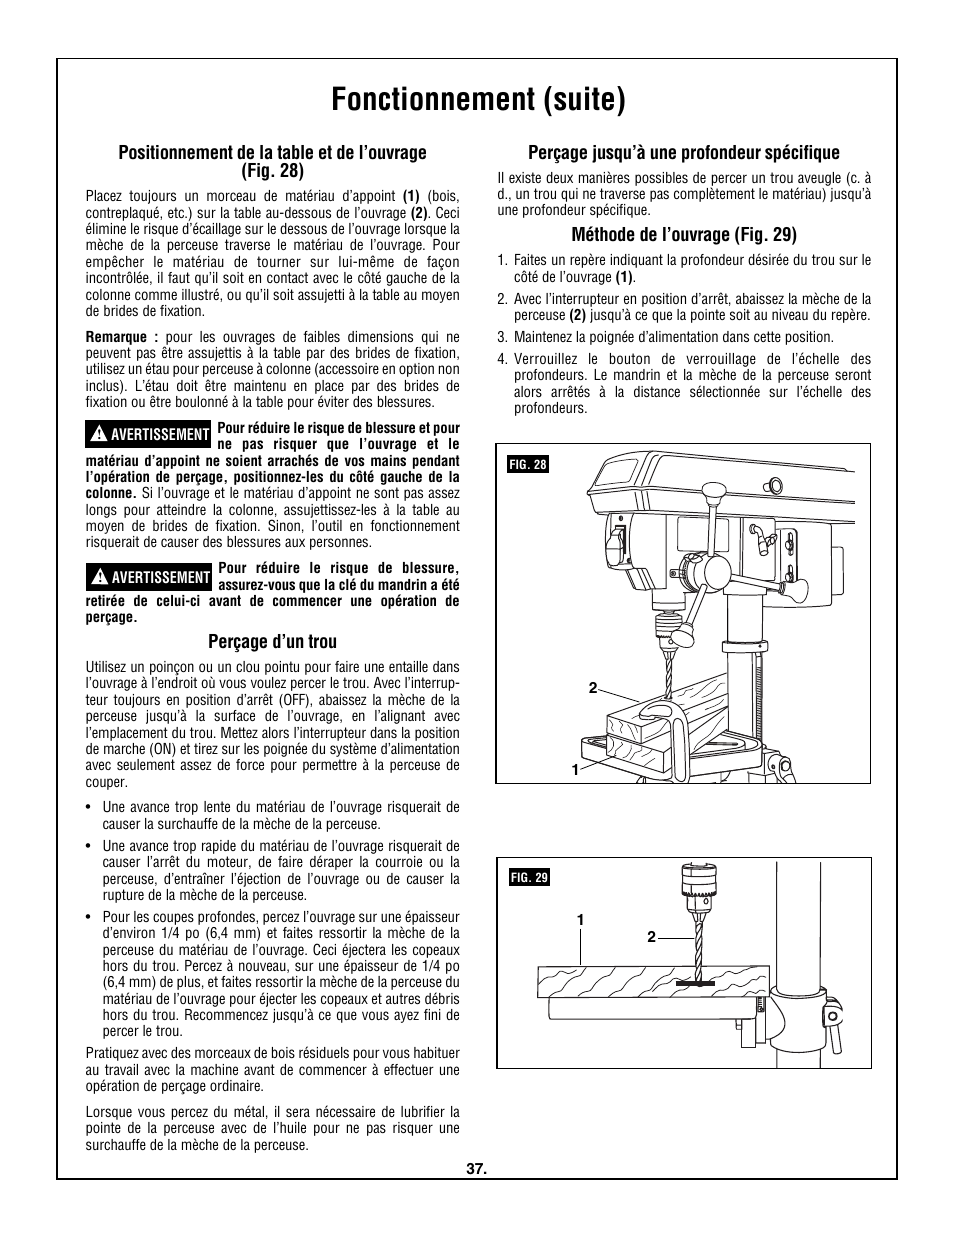 fonctionnement suite skil 3320 01 user manual page 37 60 rh manualsdir com